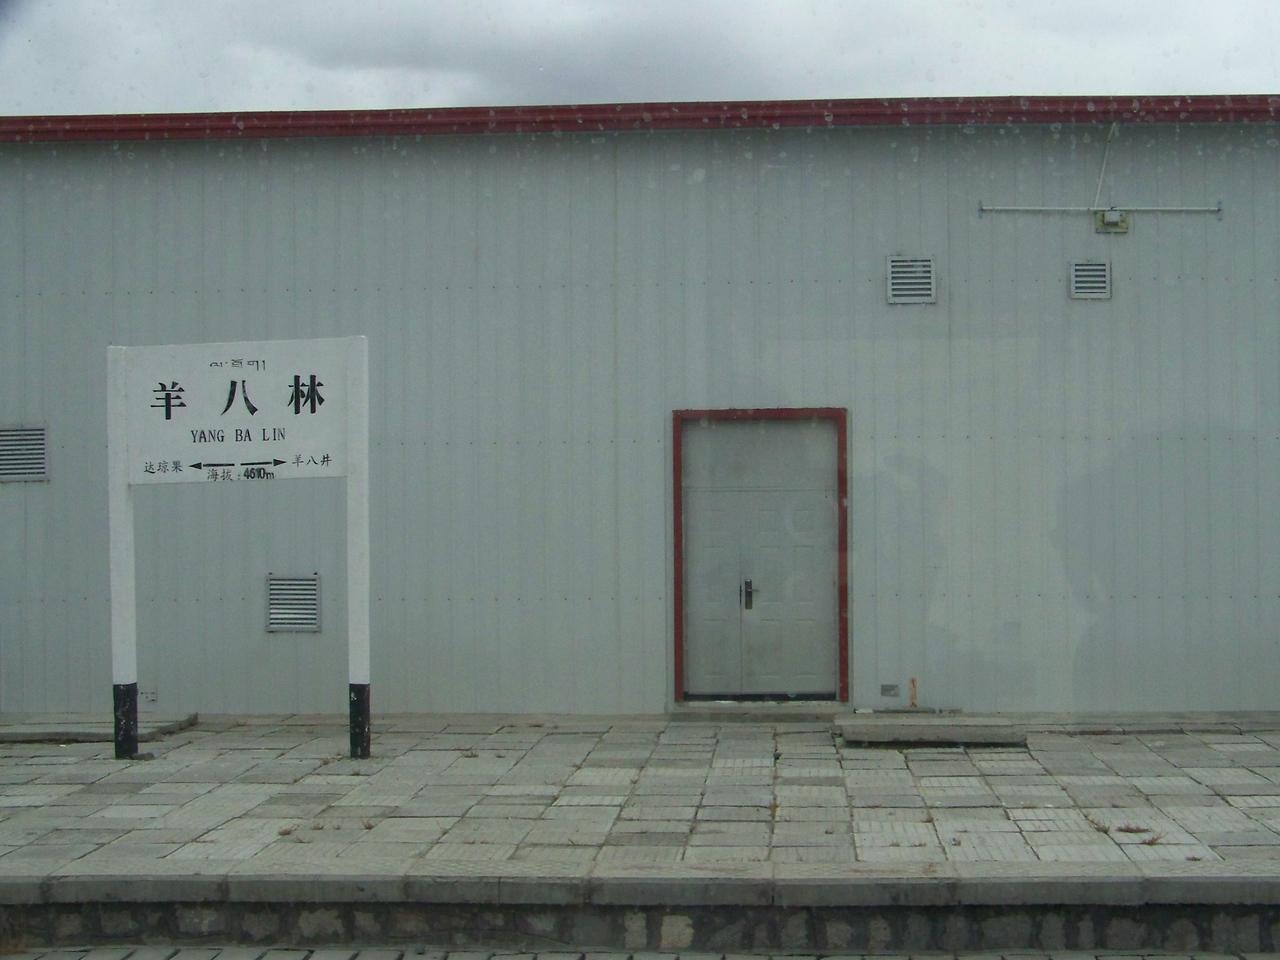 0121 - Yang Ba Lin Station on Train Trip Between Beijing and Lhasa.JPG